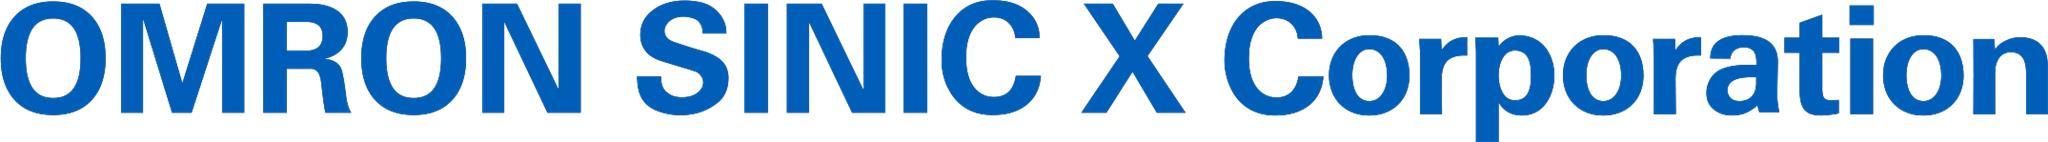 OMRON SINIC X Corporation